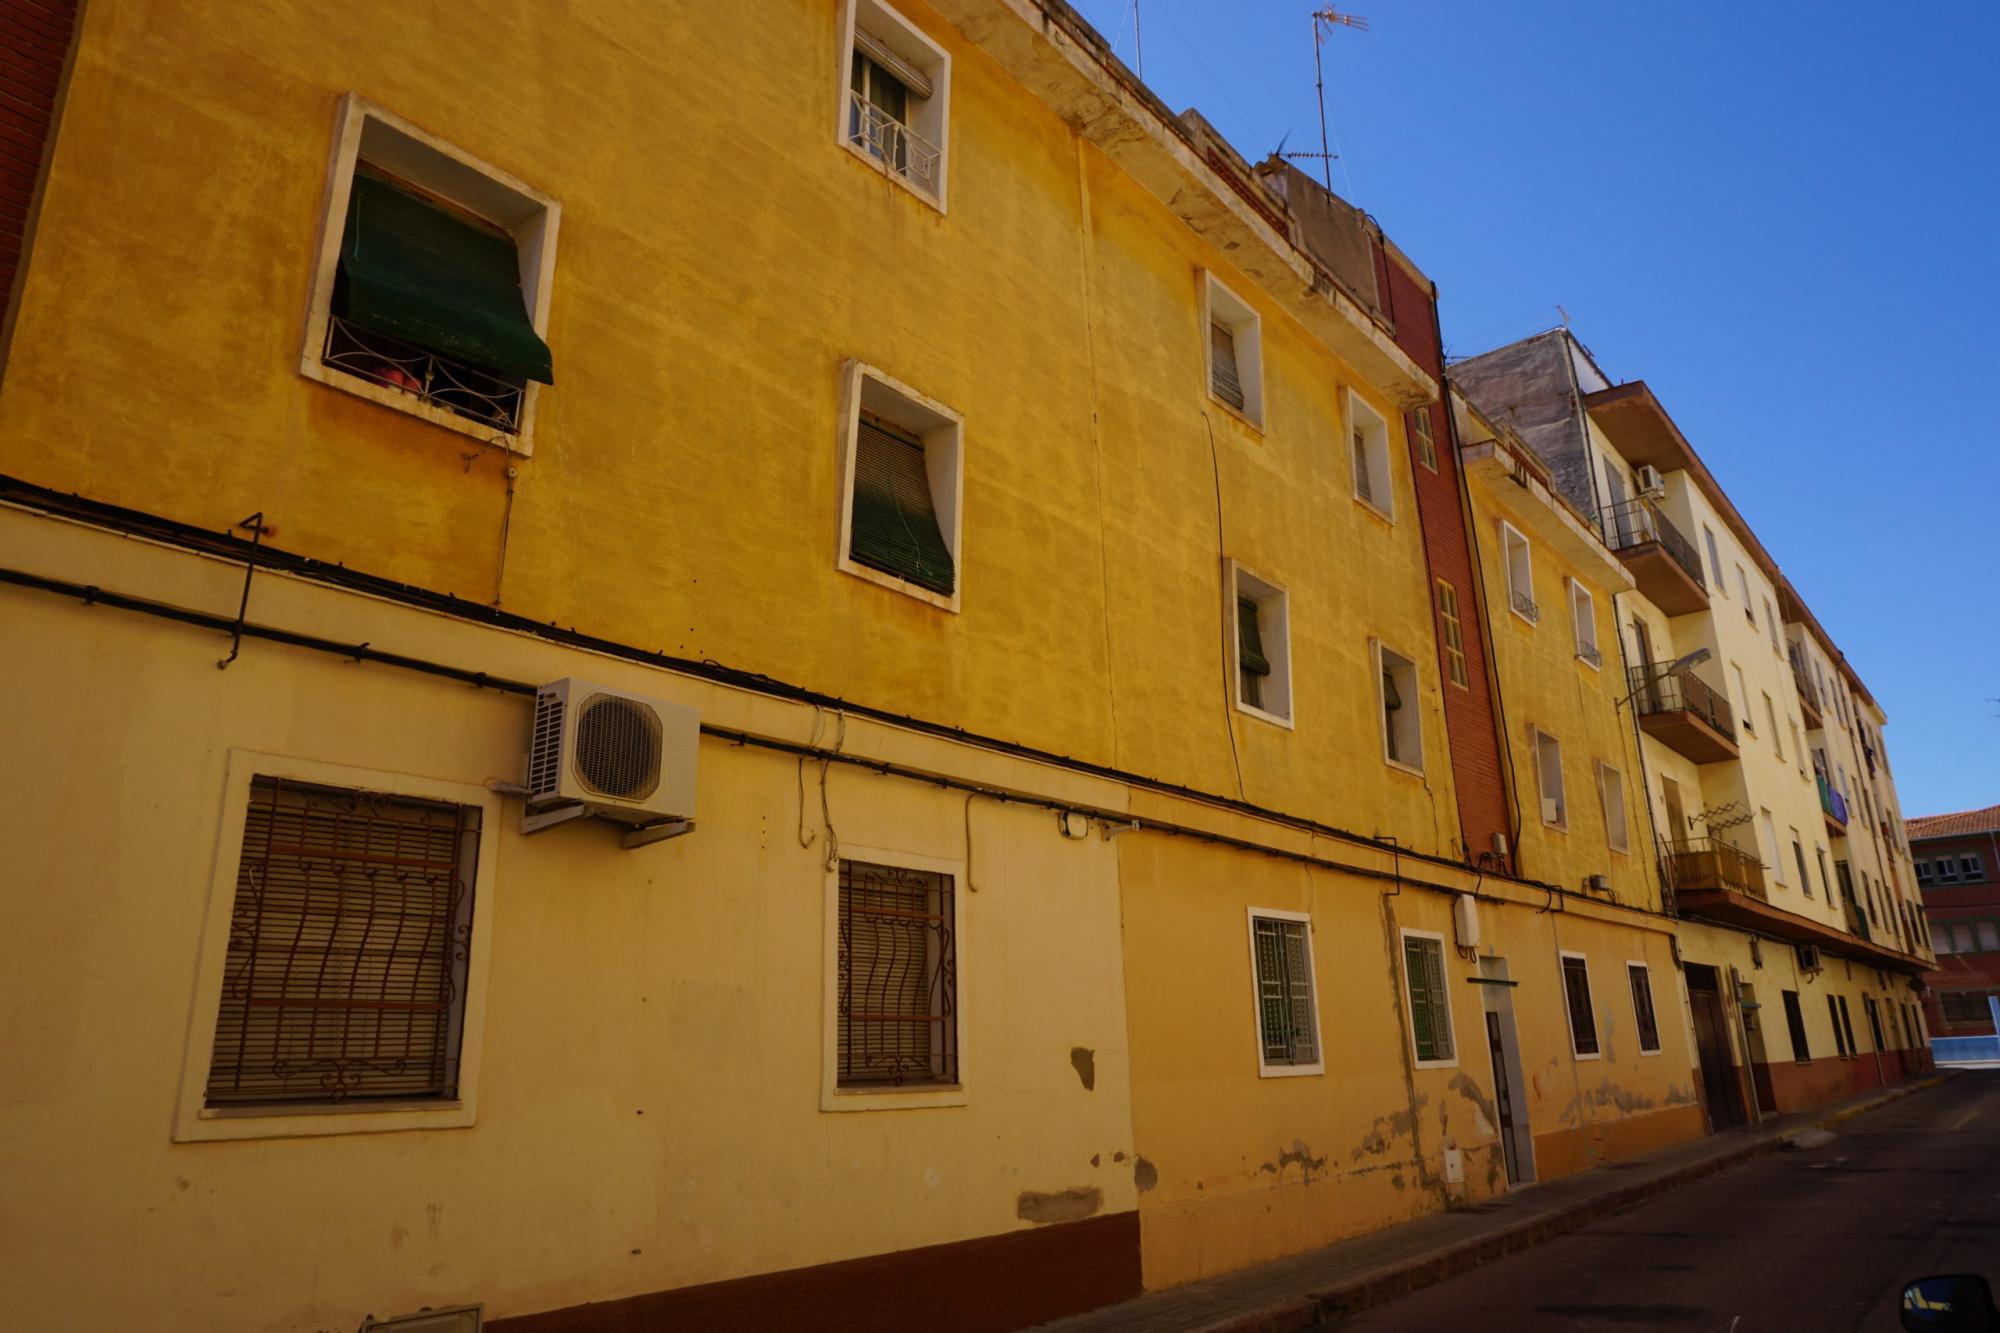 Piso en venta en Burriana (Castellón) zona Bosca